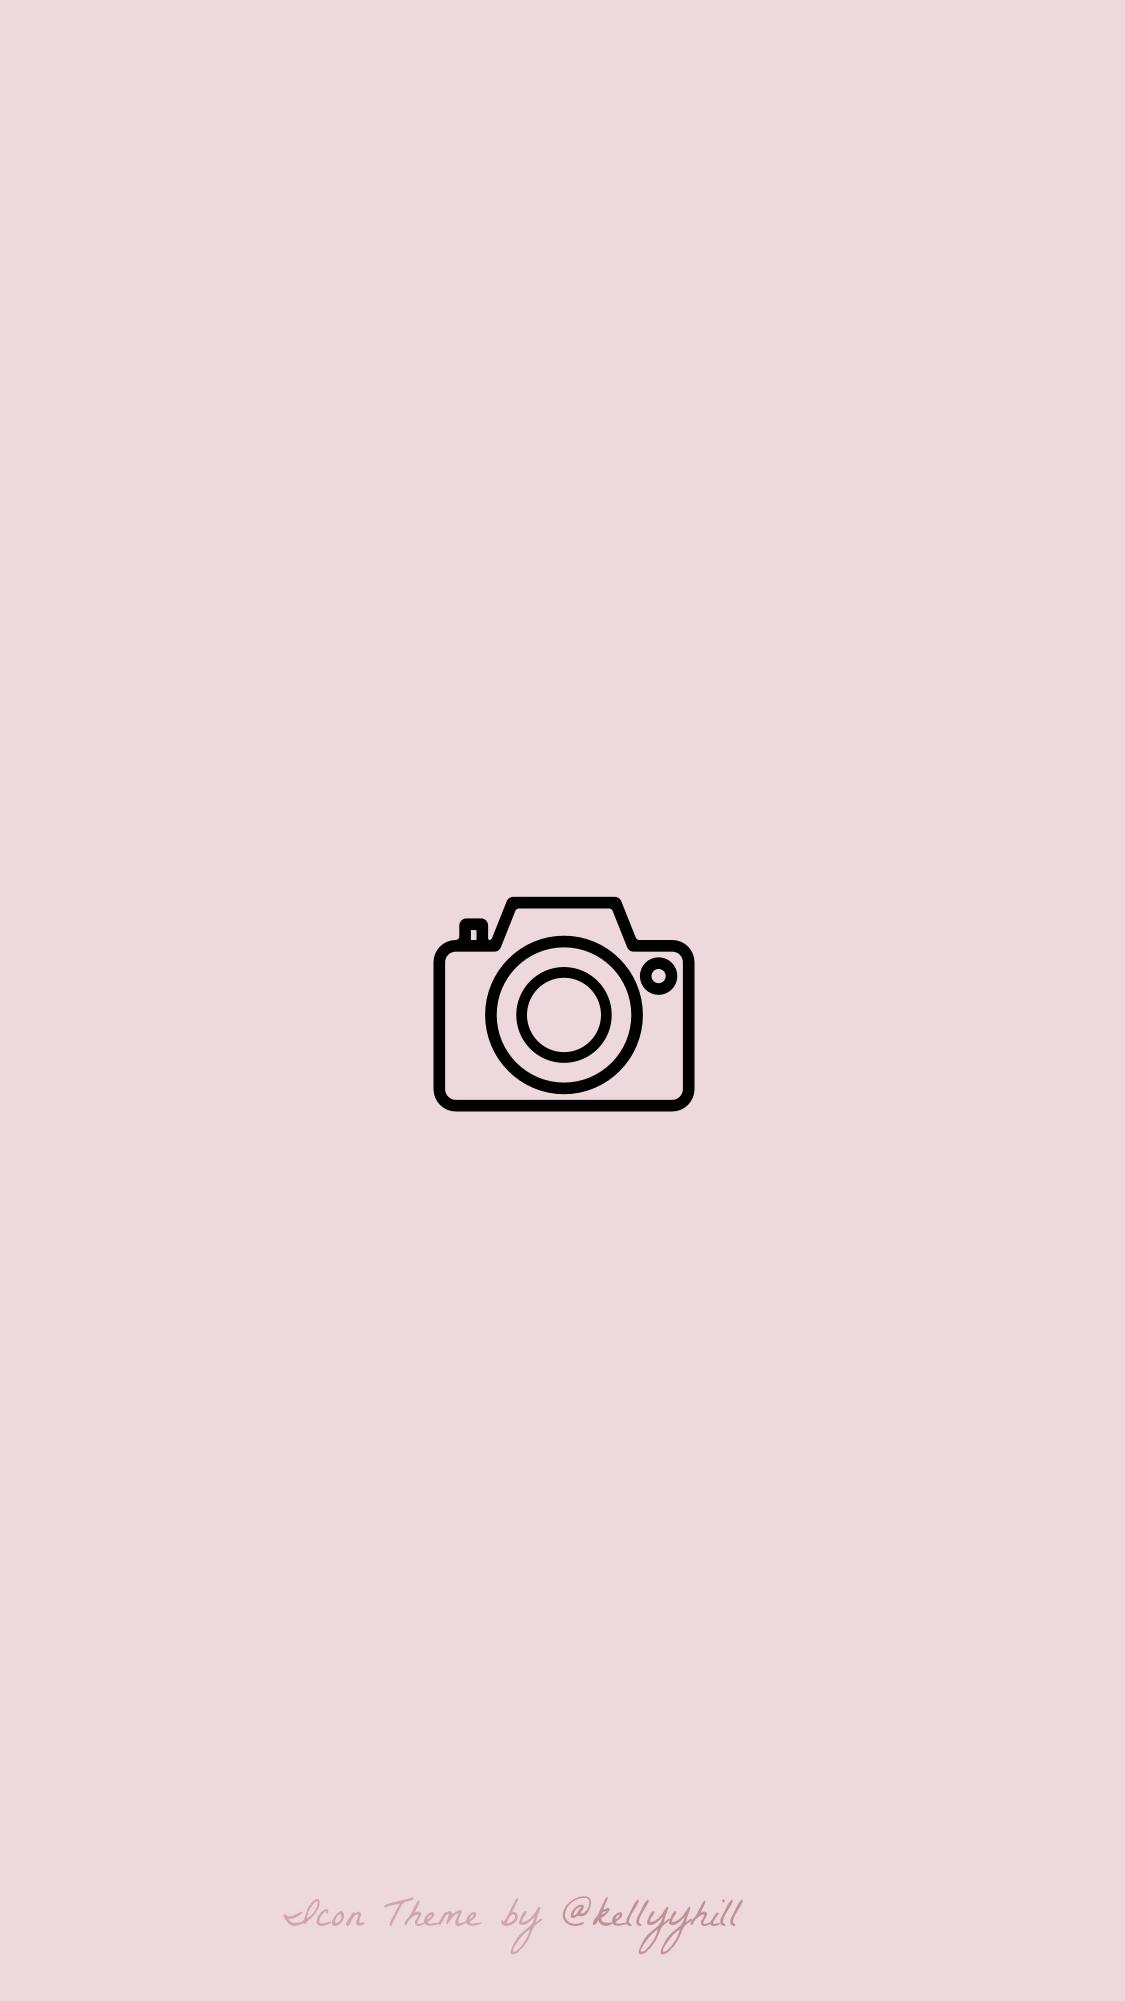 Gambar Highlight Instagram Pink Eye Candy Photograph